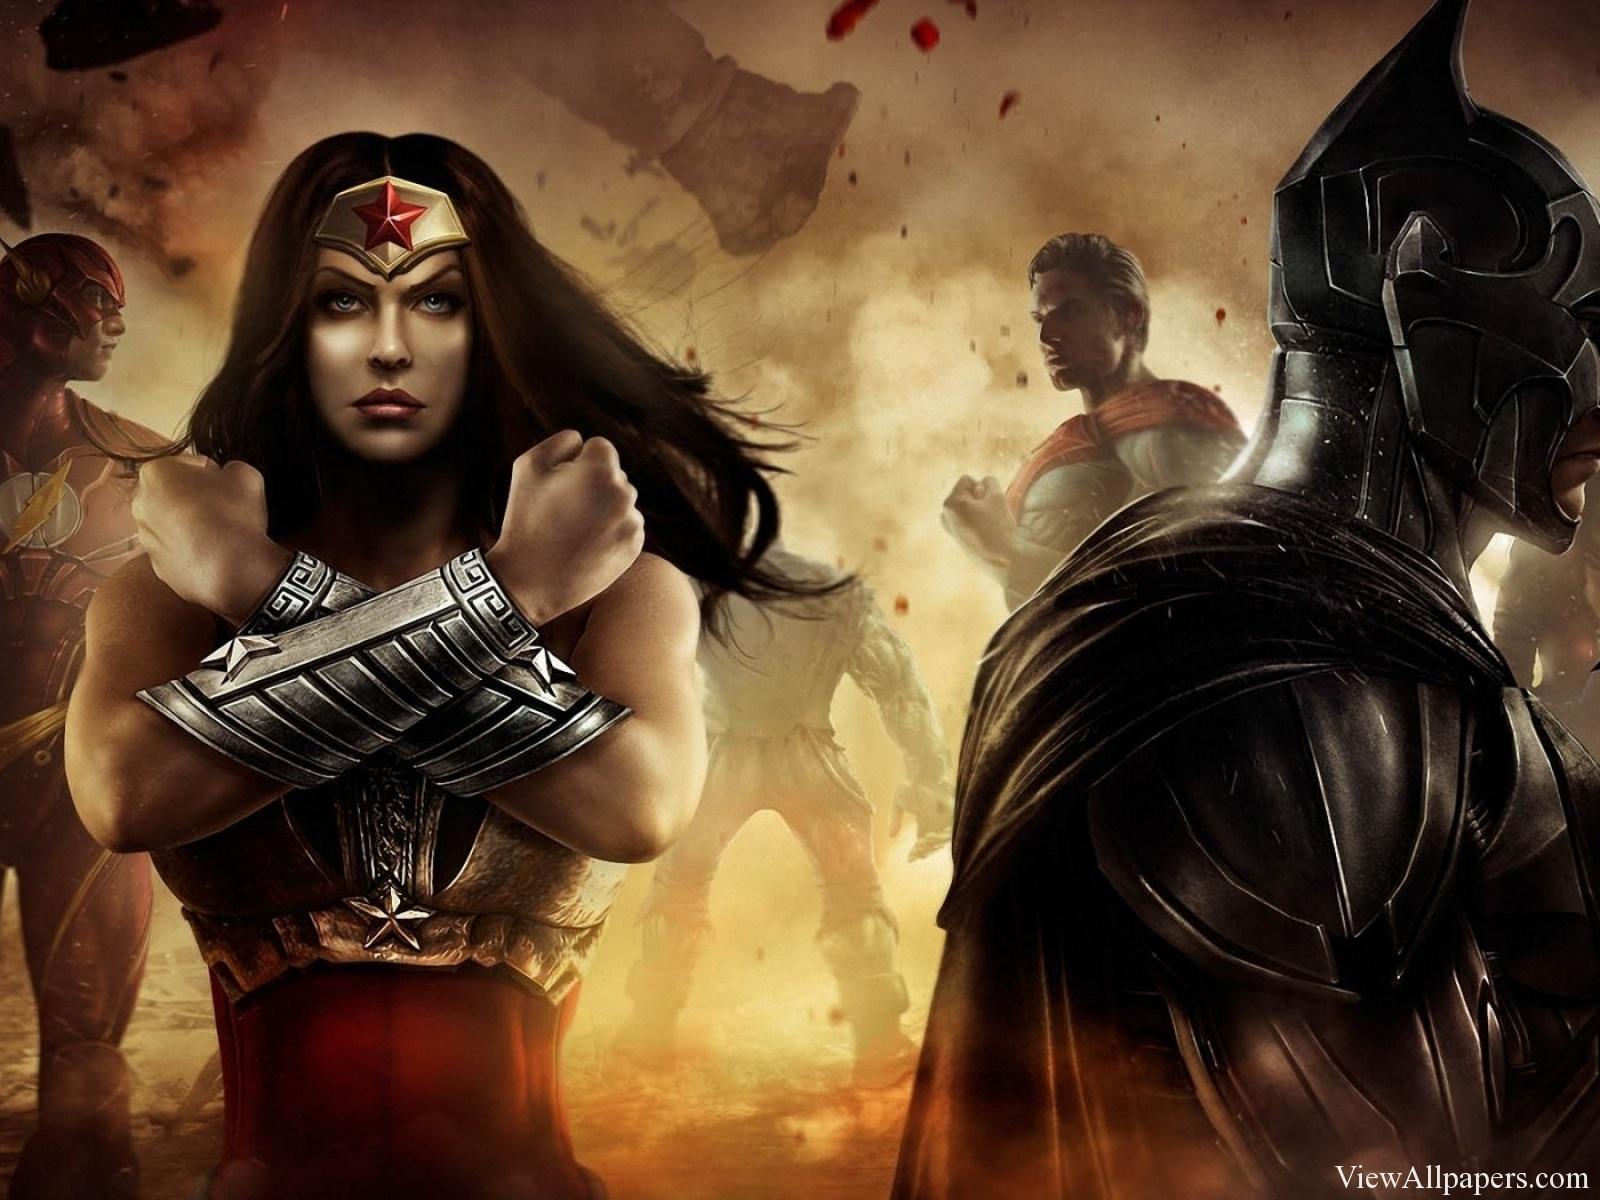 1280x1024 Wonder Woman Movie 1280x1024 Resolution Hd 4k: Superman Wonder Woman Wallpaper